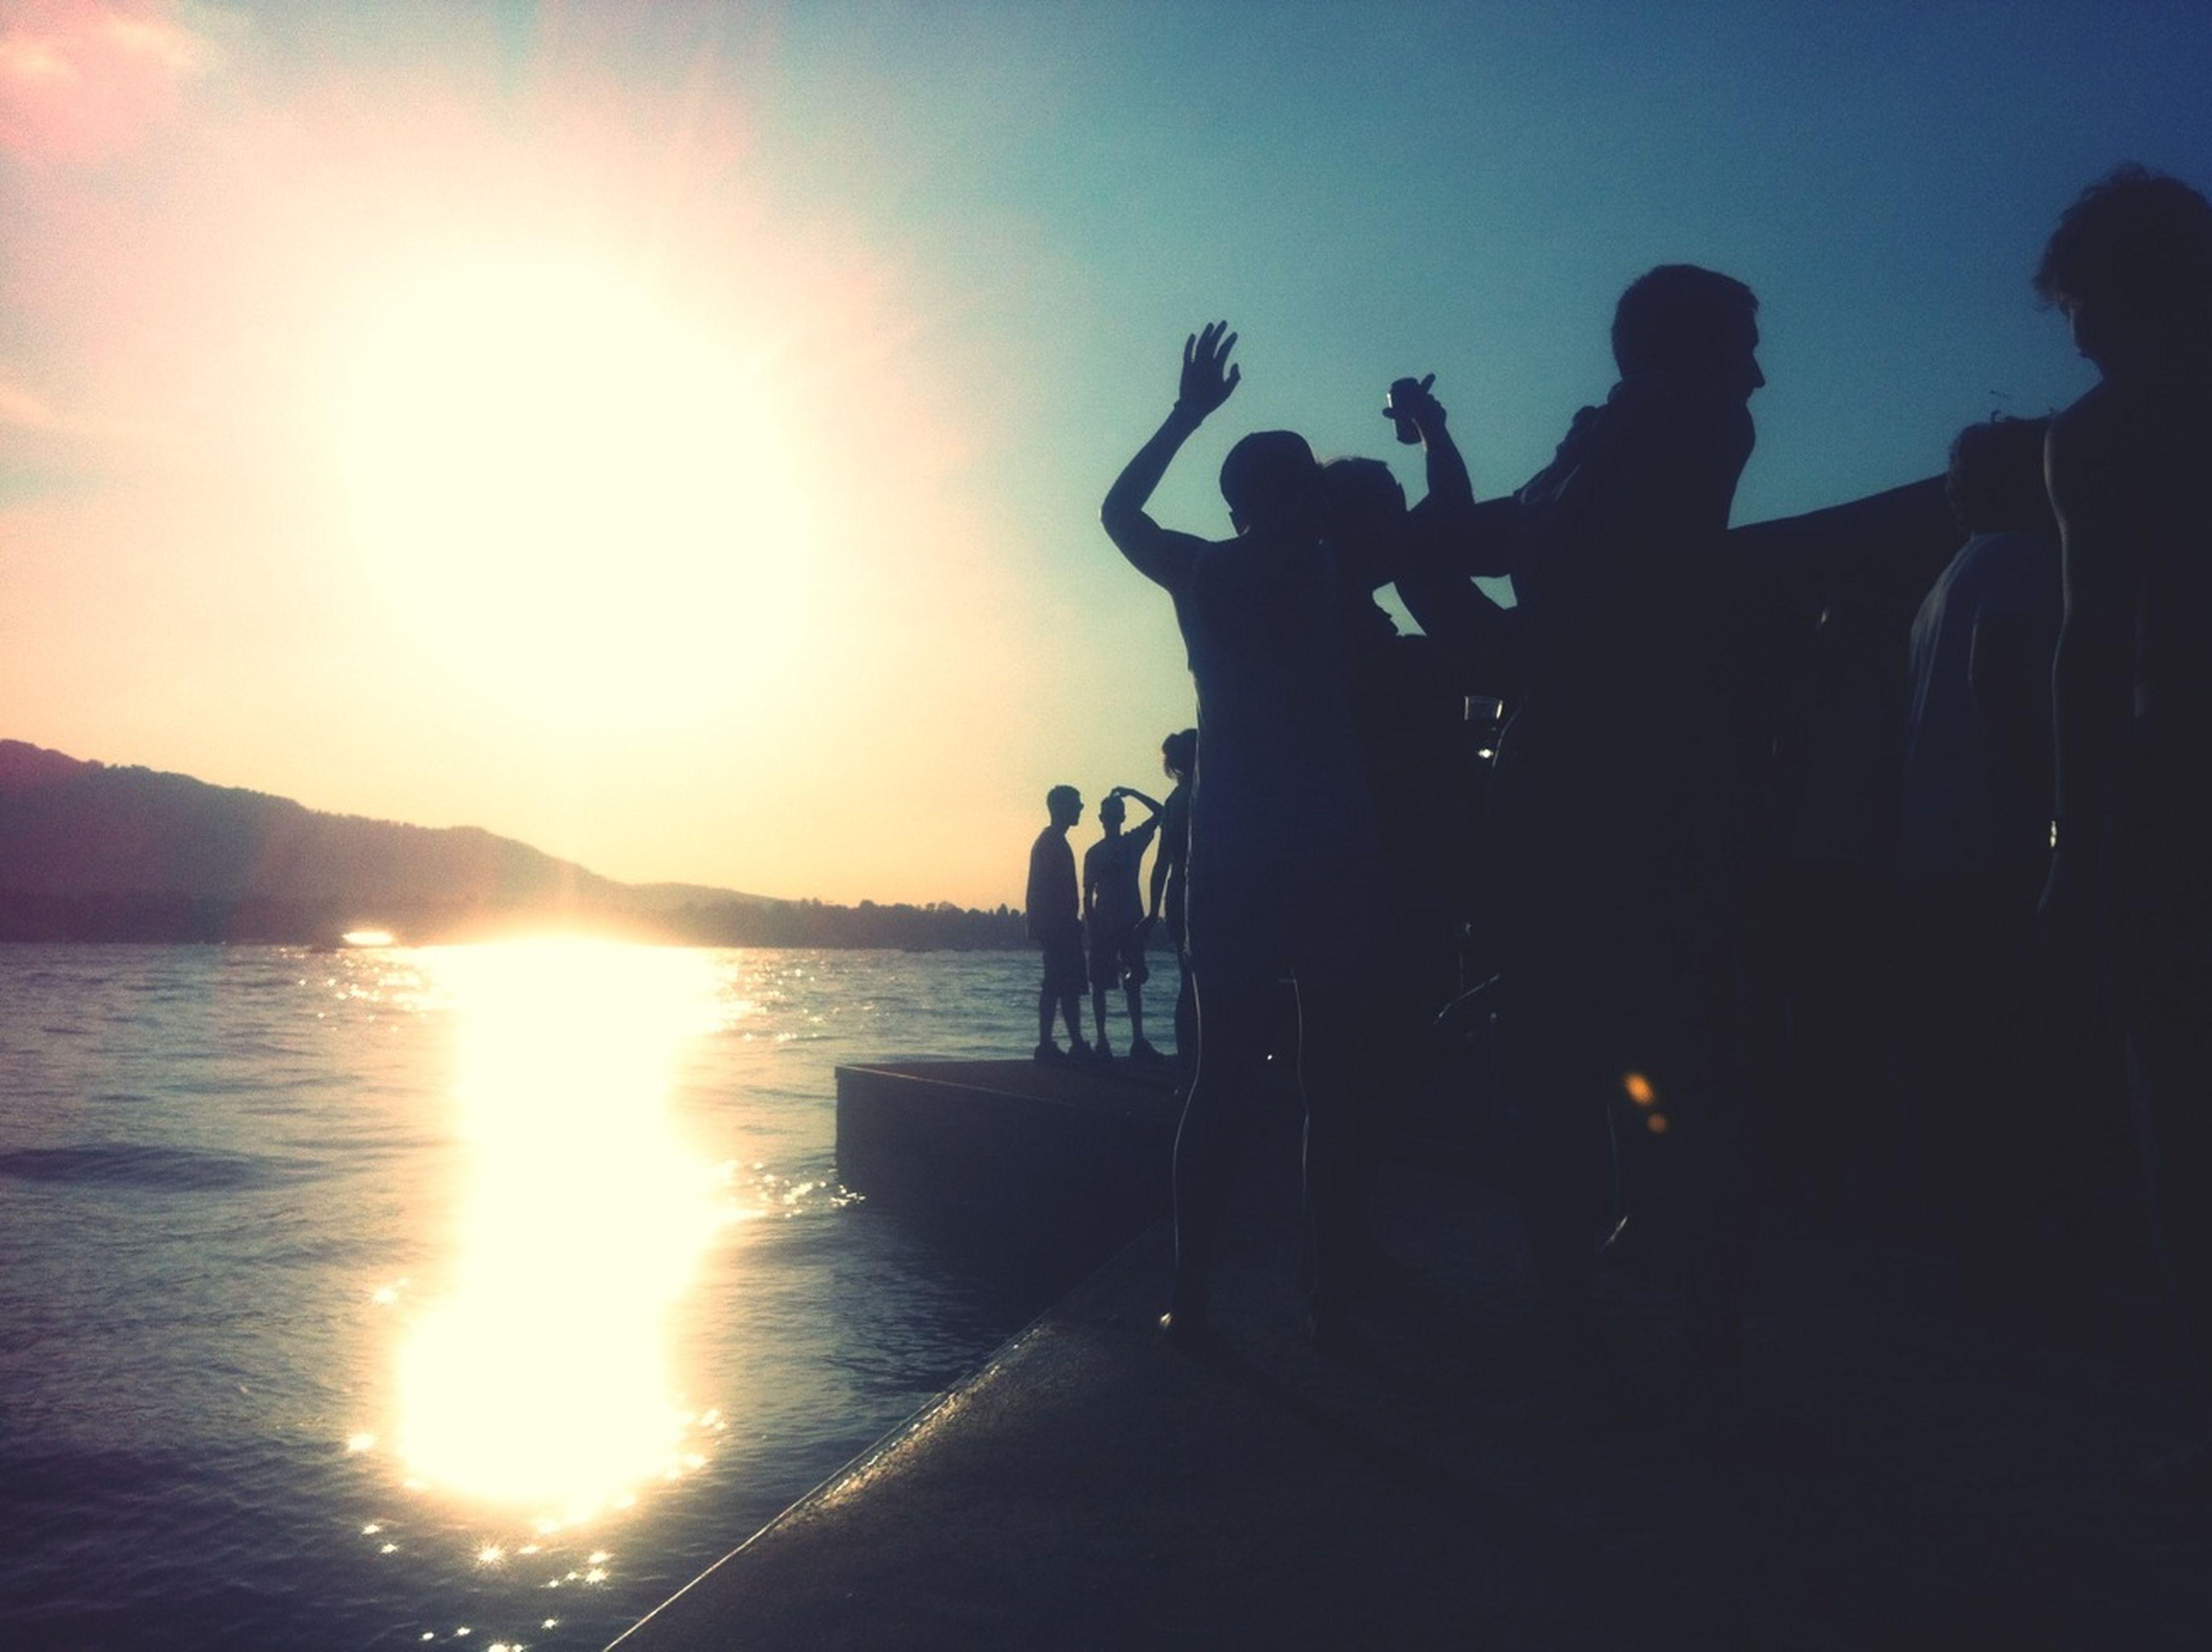 sun, water, sunset, sunlight, sunbeam, silhouette, sea, lifestyles, lens flare, leisure activity, sky, men, beach, medium group of people, person, shore, nature, travel, sunny